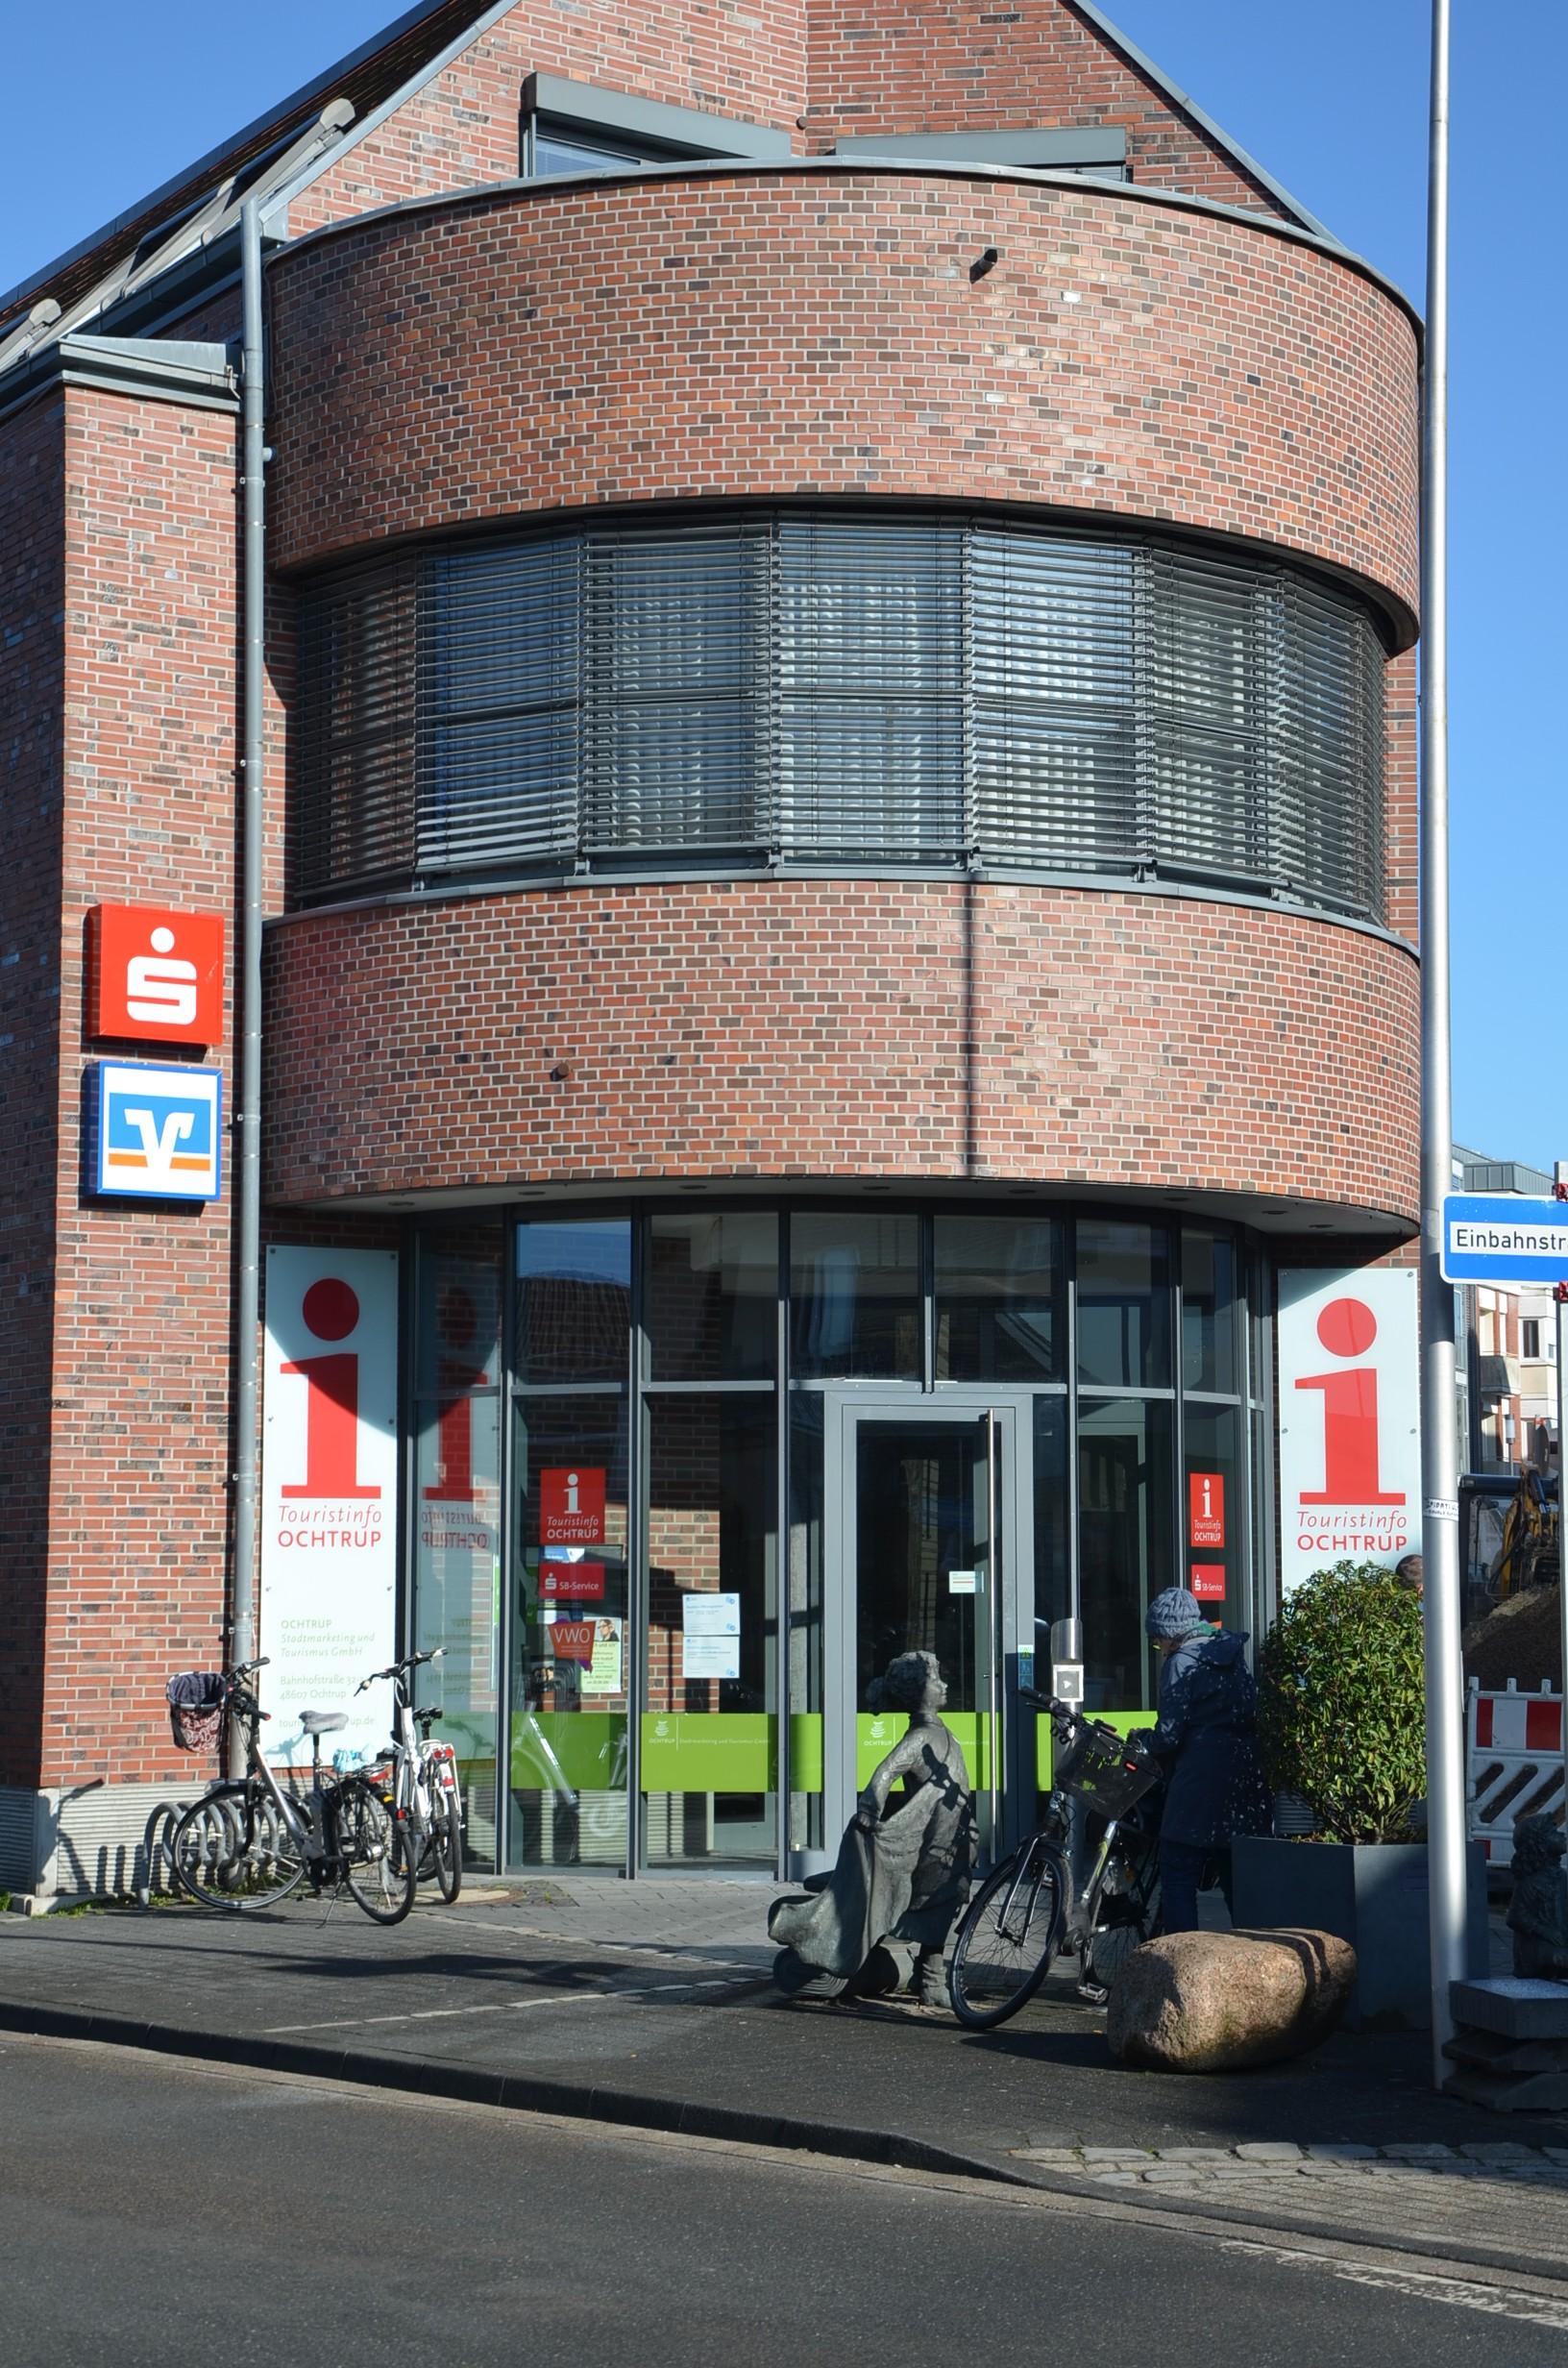 Volksbank Ochtrup-Laer eG, Volksbank Ochtrup-Laer eG - SB-Filiale Bahnhofstraße, Bahnhofstraße 17, 48607, Ochtrup